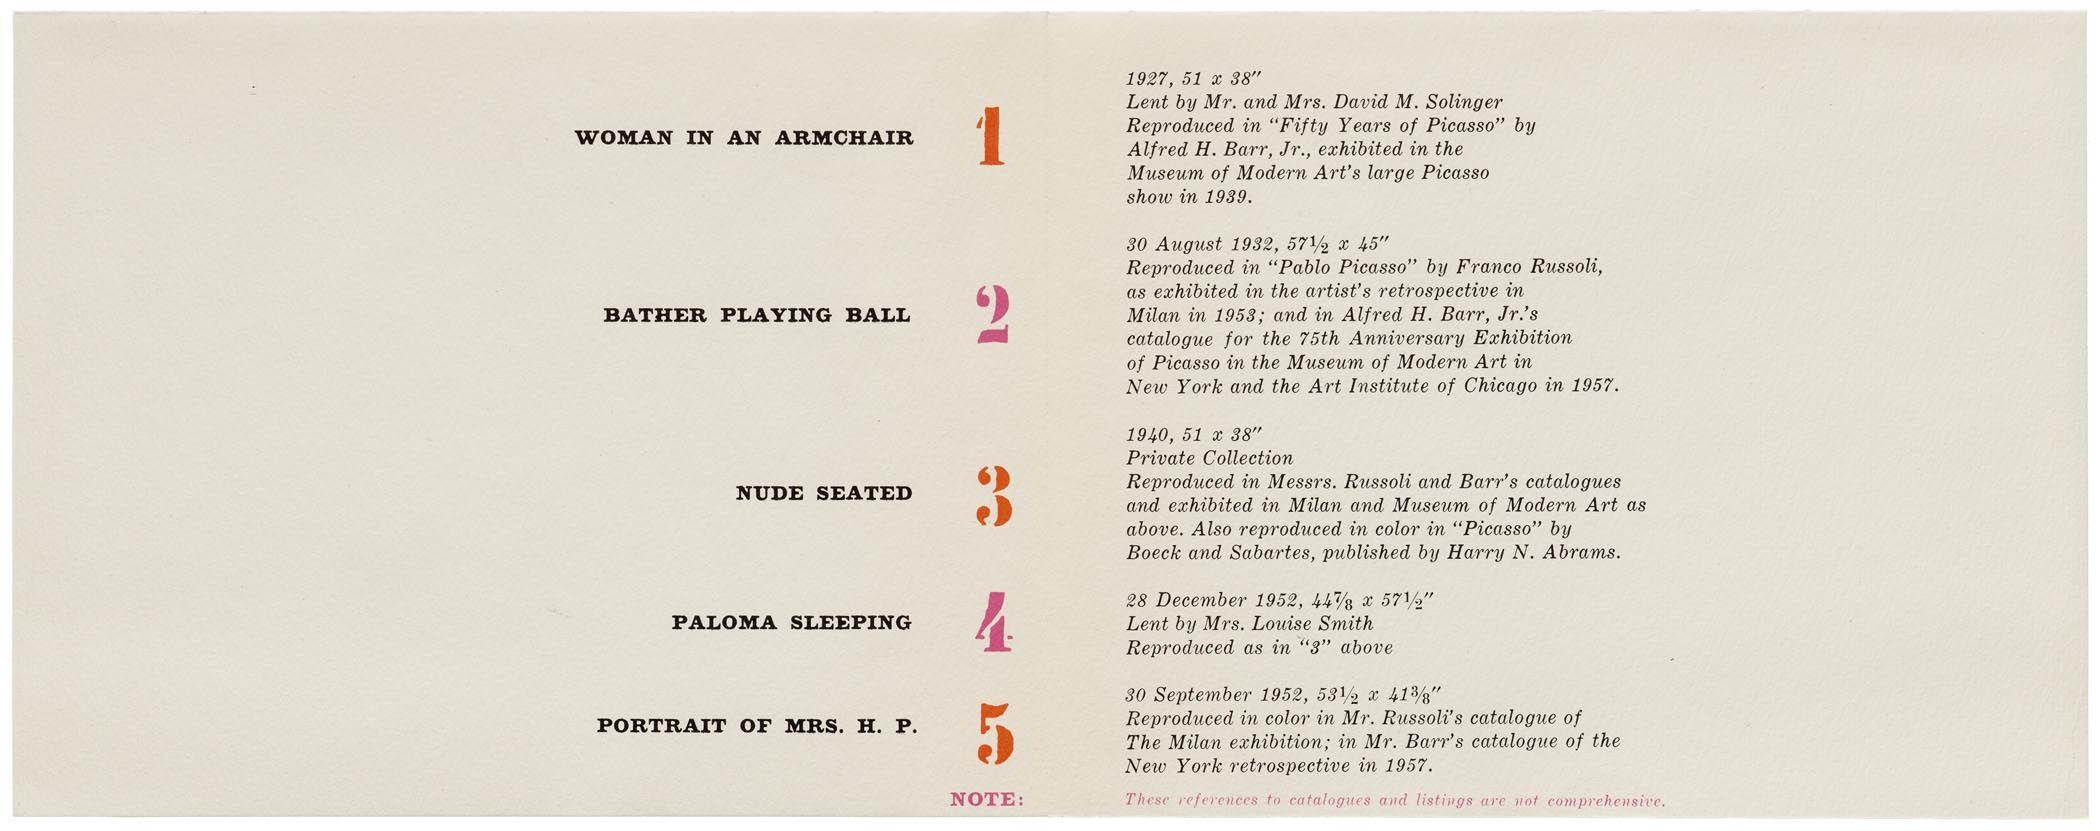 Elaine Lustig Cohen Exhibition Catalog For Picasso The Master